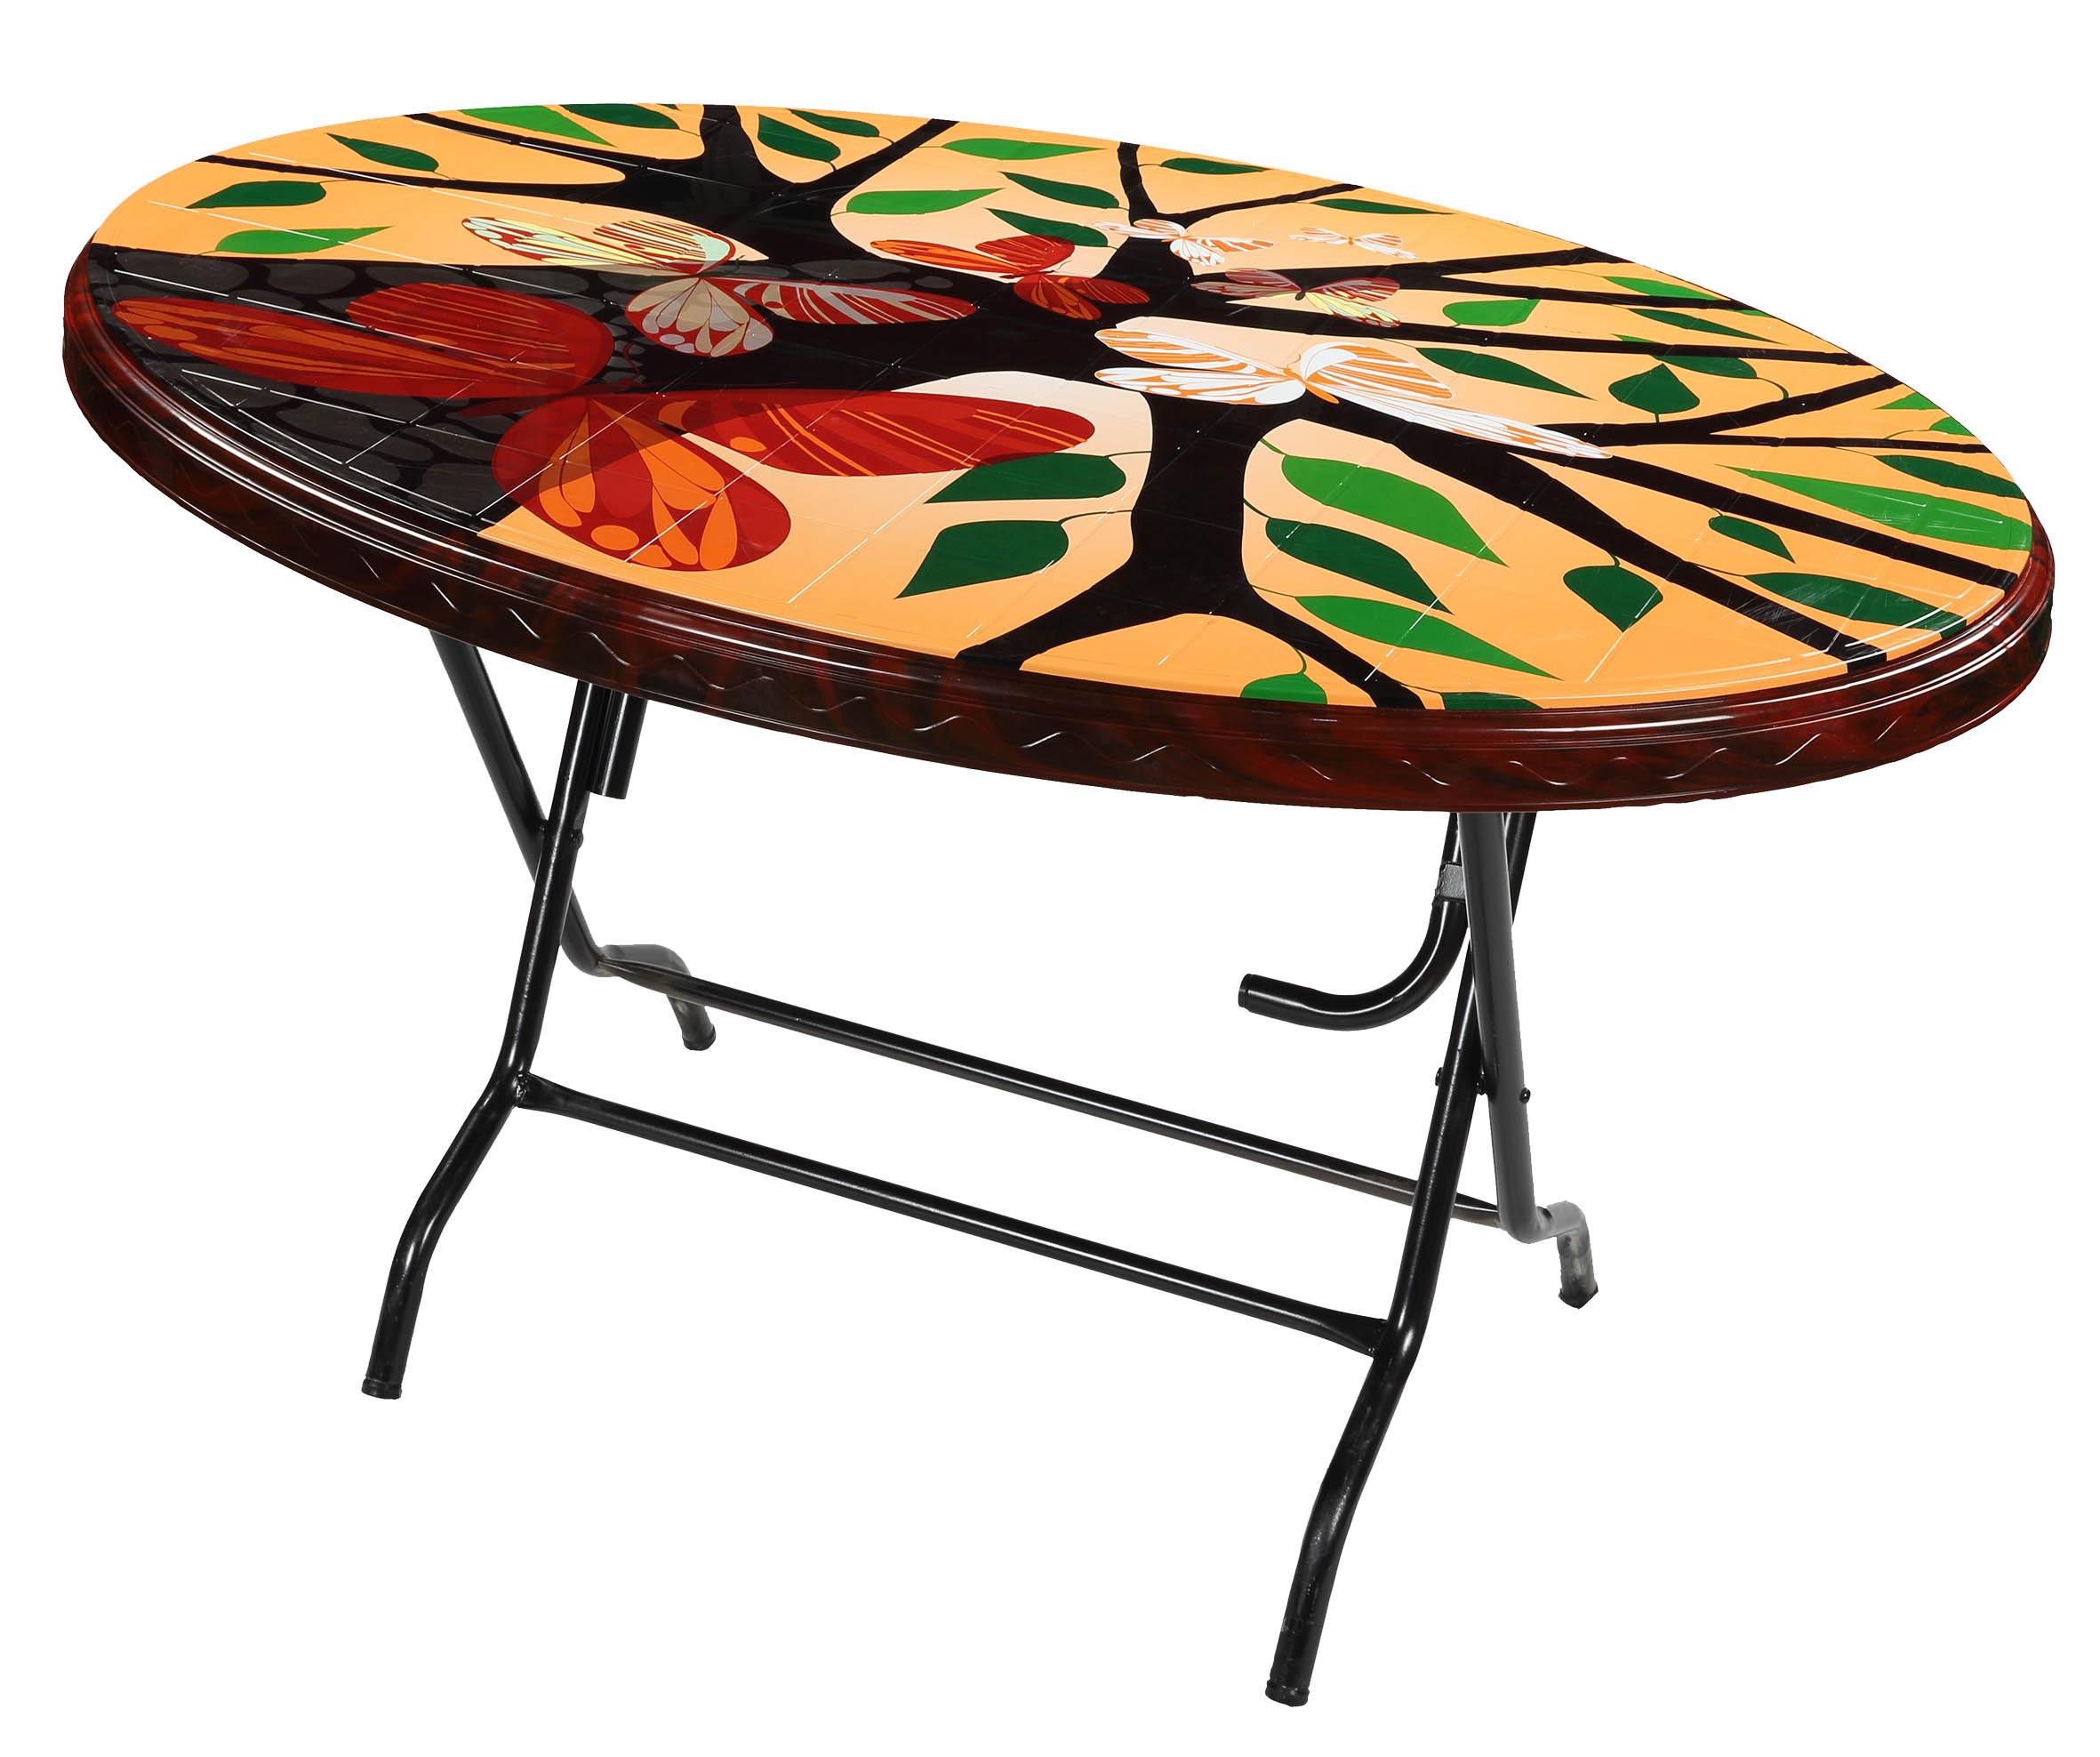 Dining Table 4 Seat Oval S/L Print Love Tree-RW